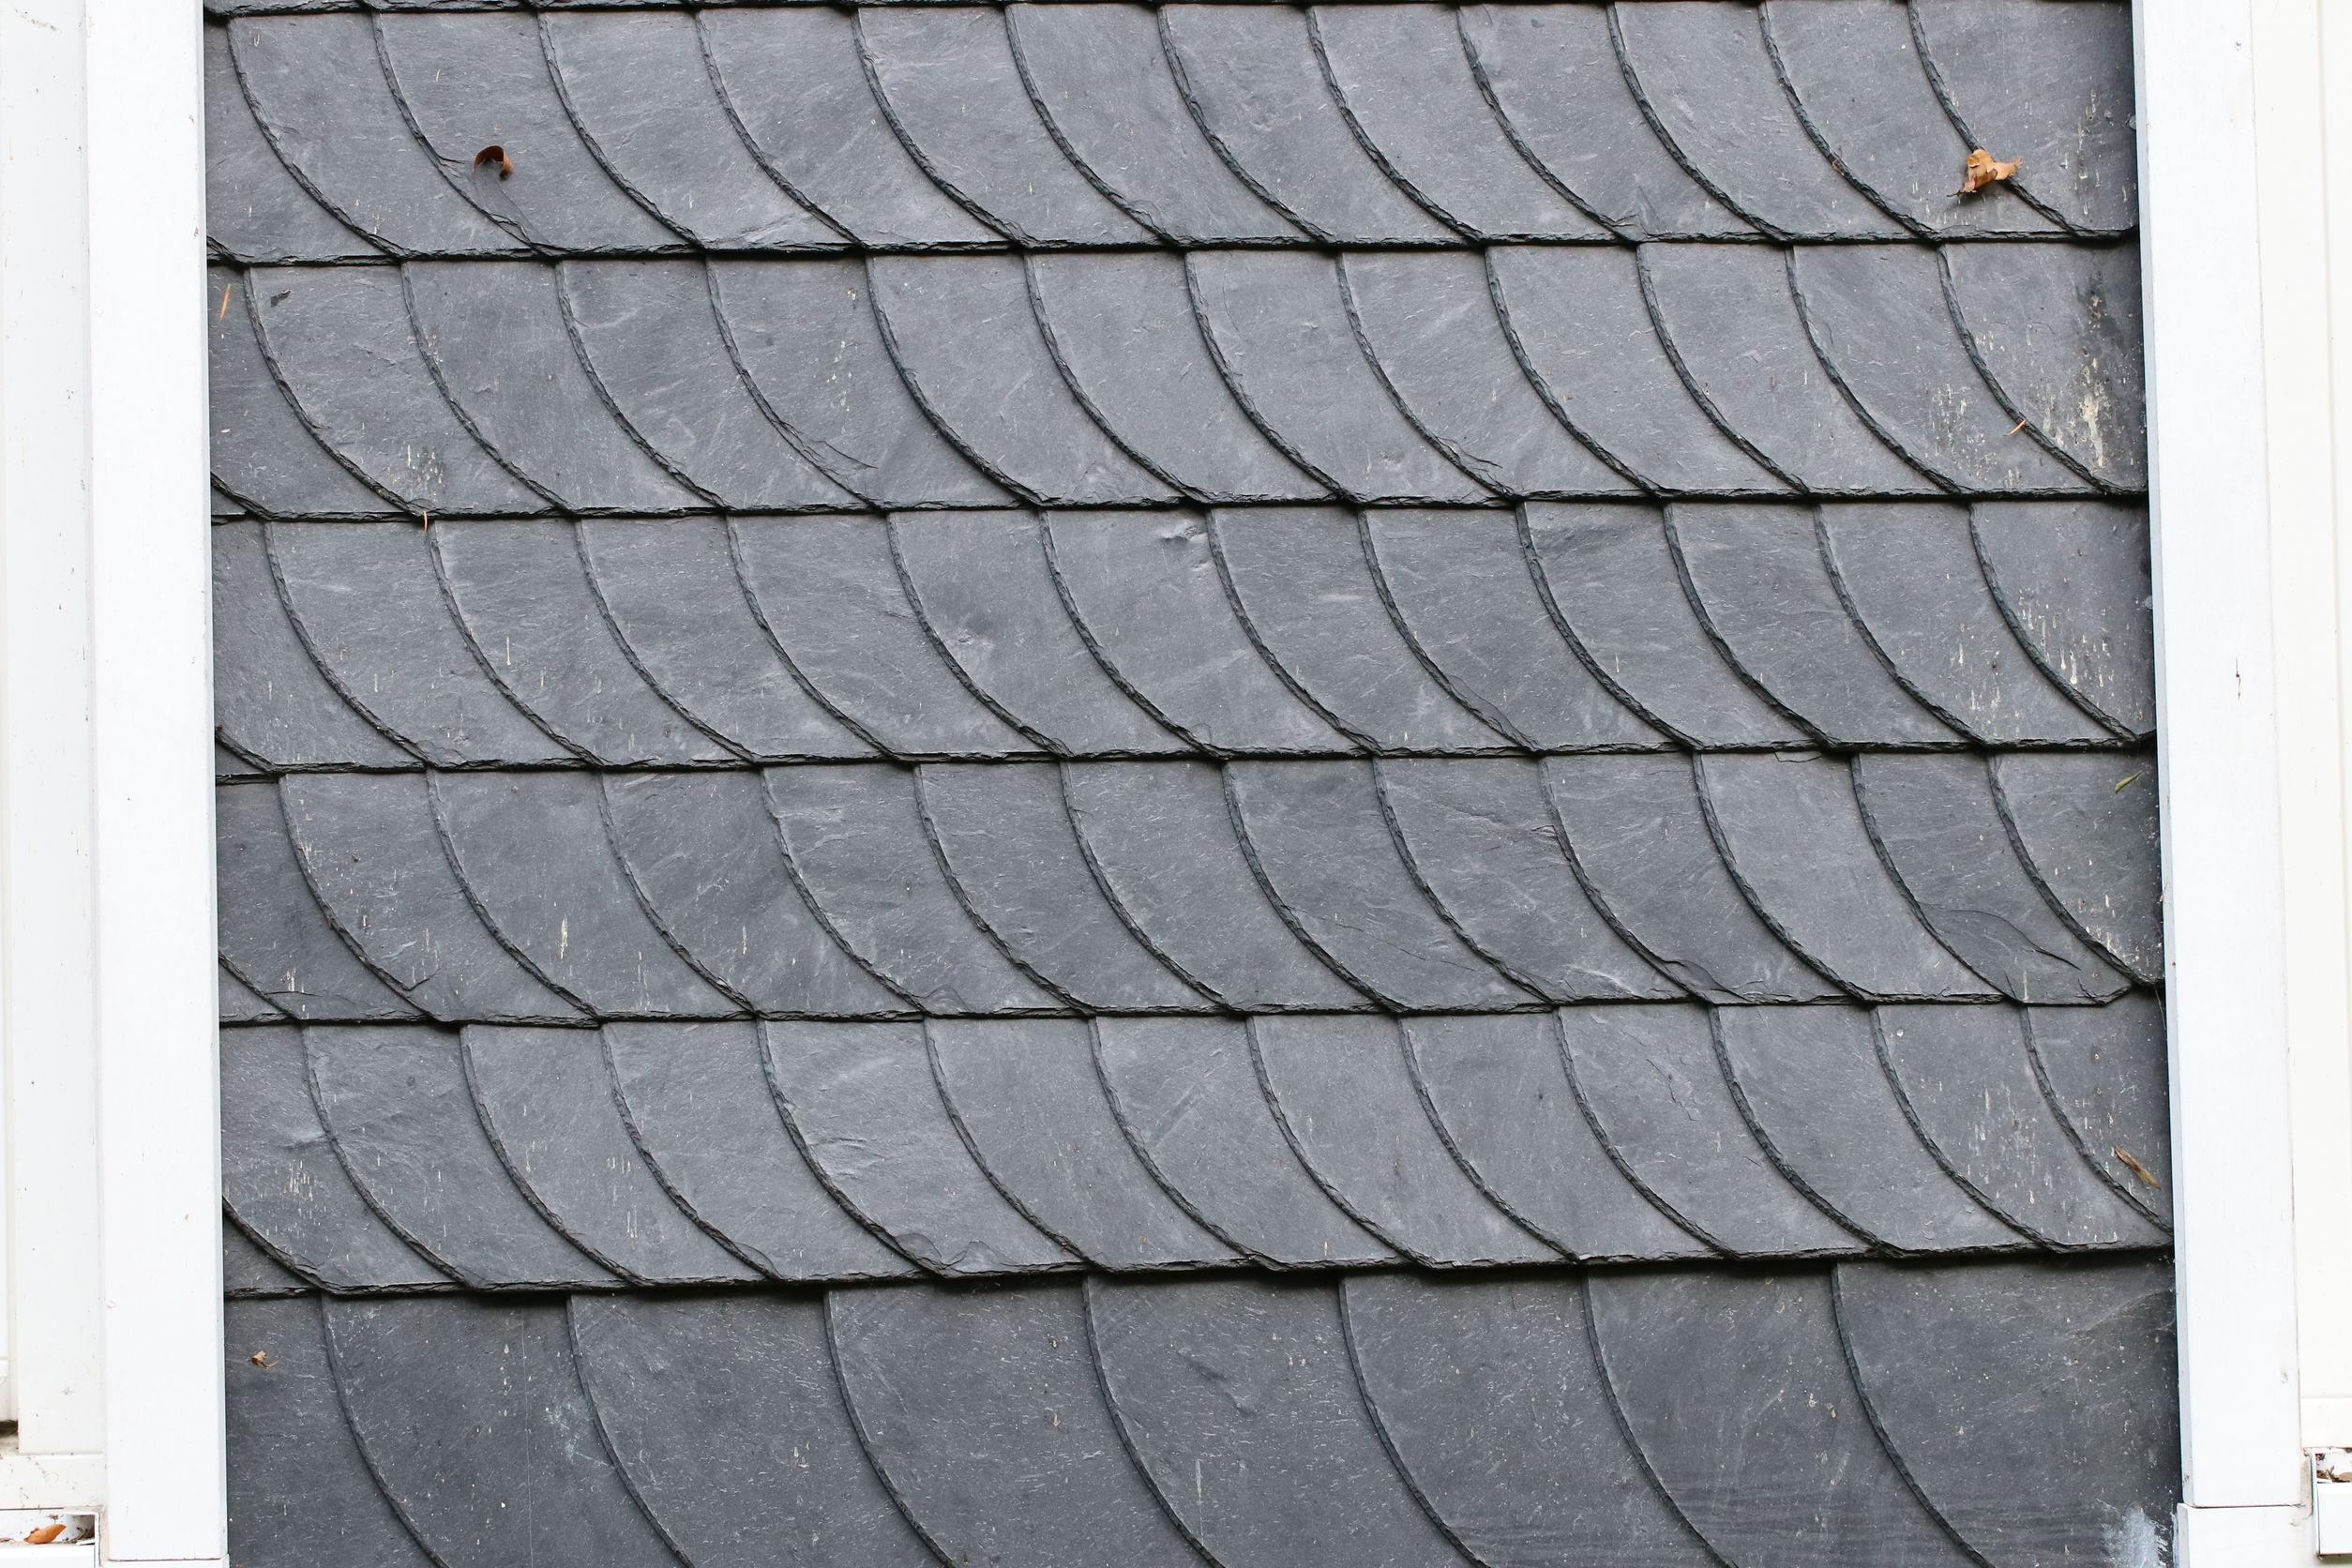 slate shingles roof